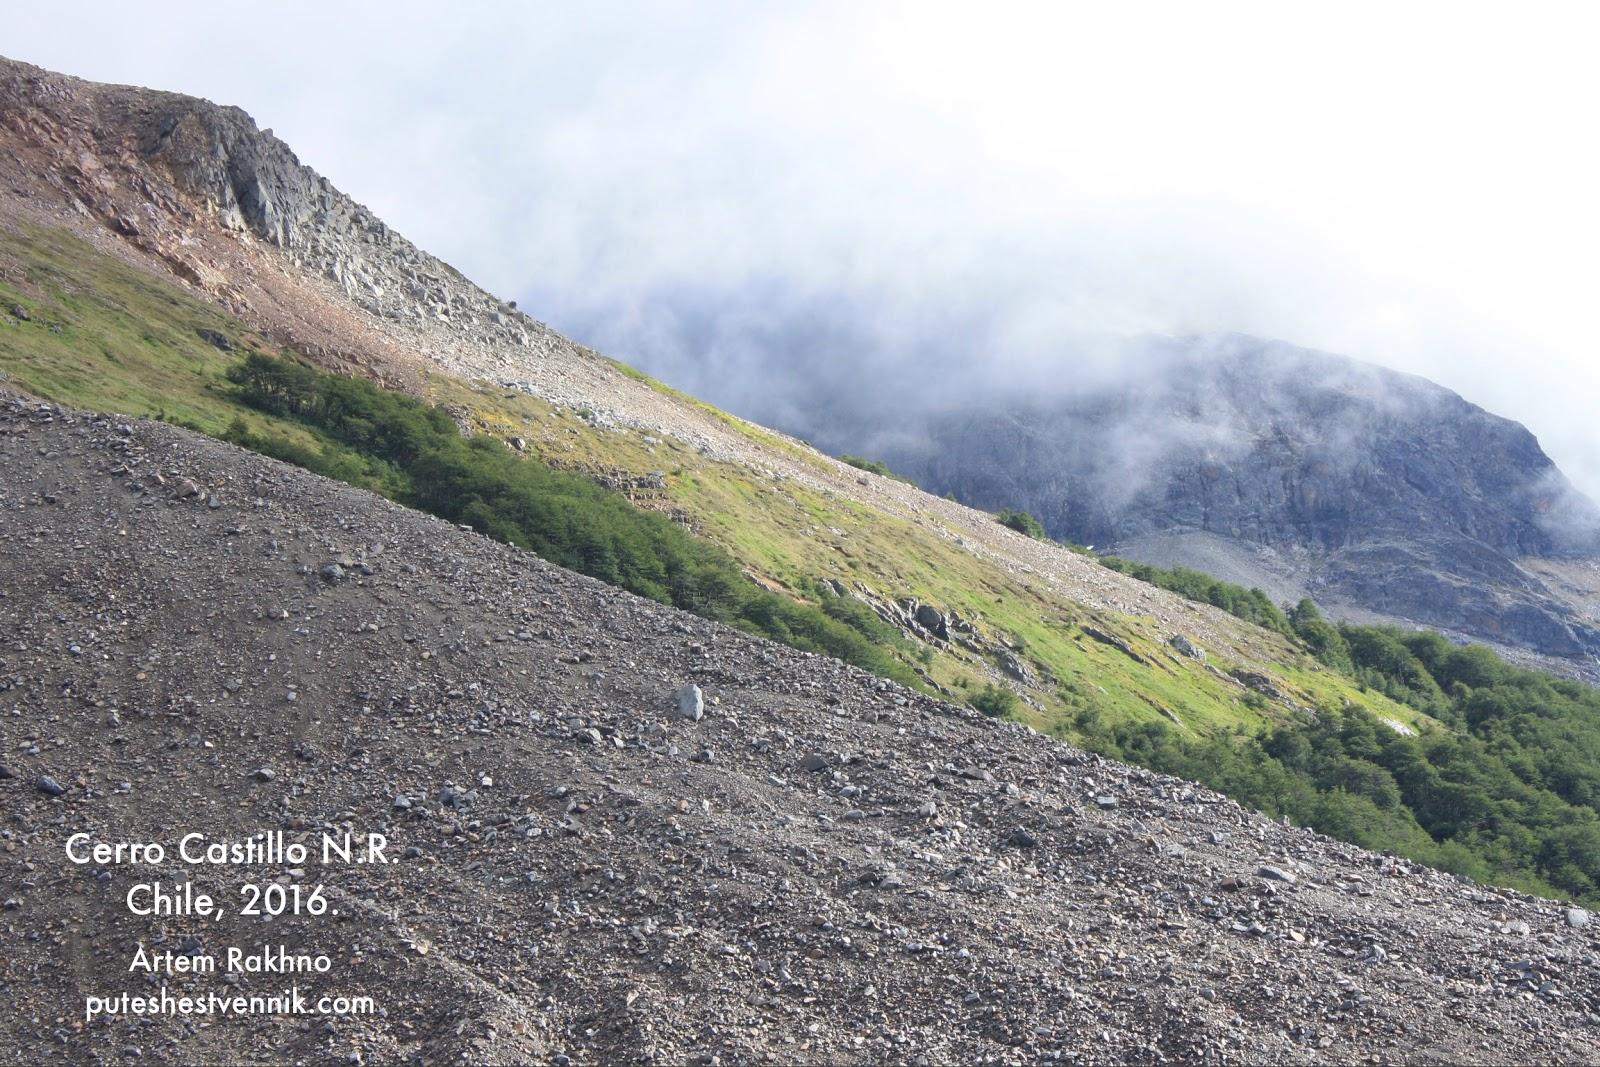 Склон горы в Серро-Кастильо